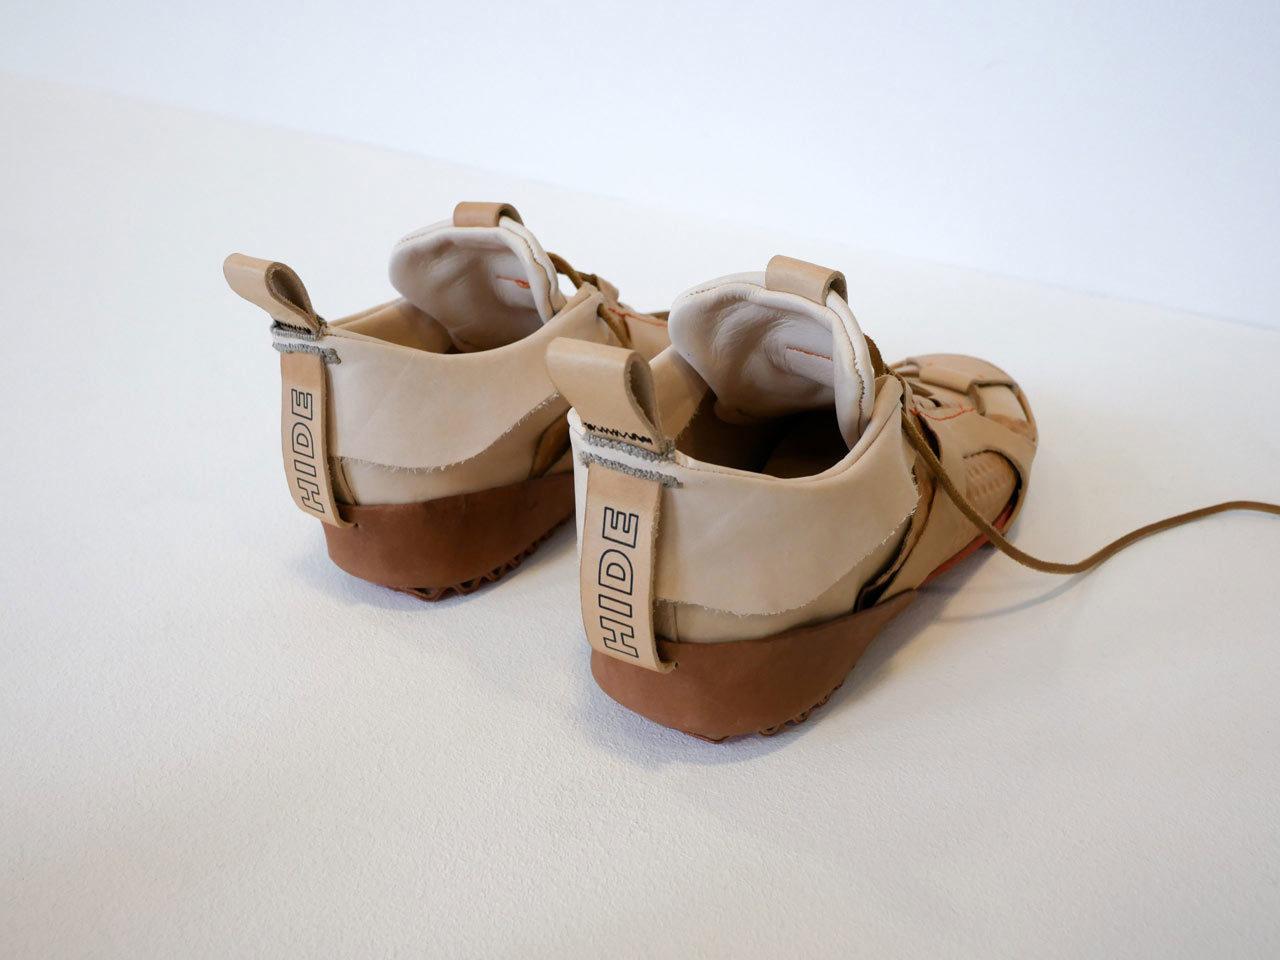 Michel Gallus footwear hide project